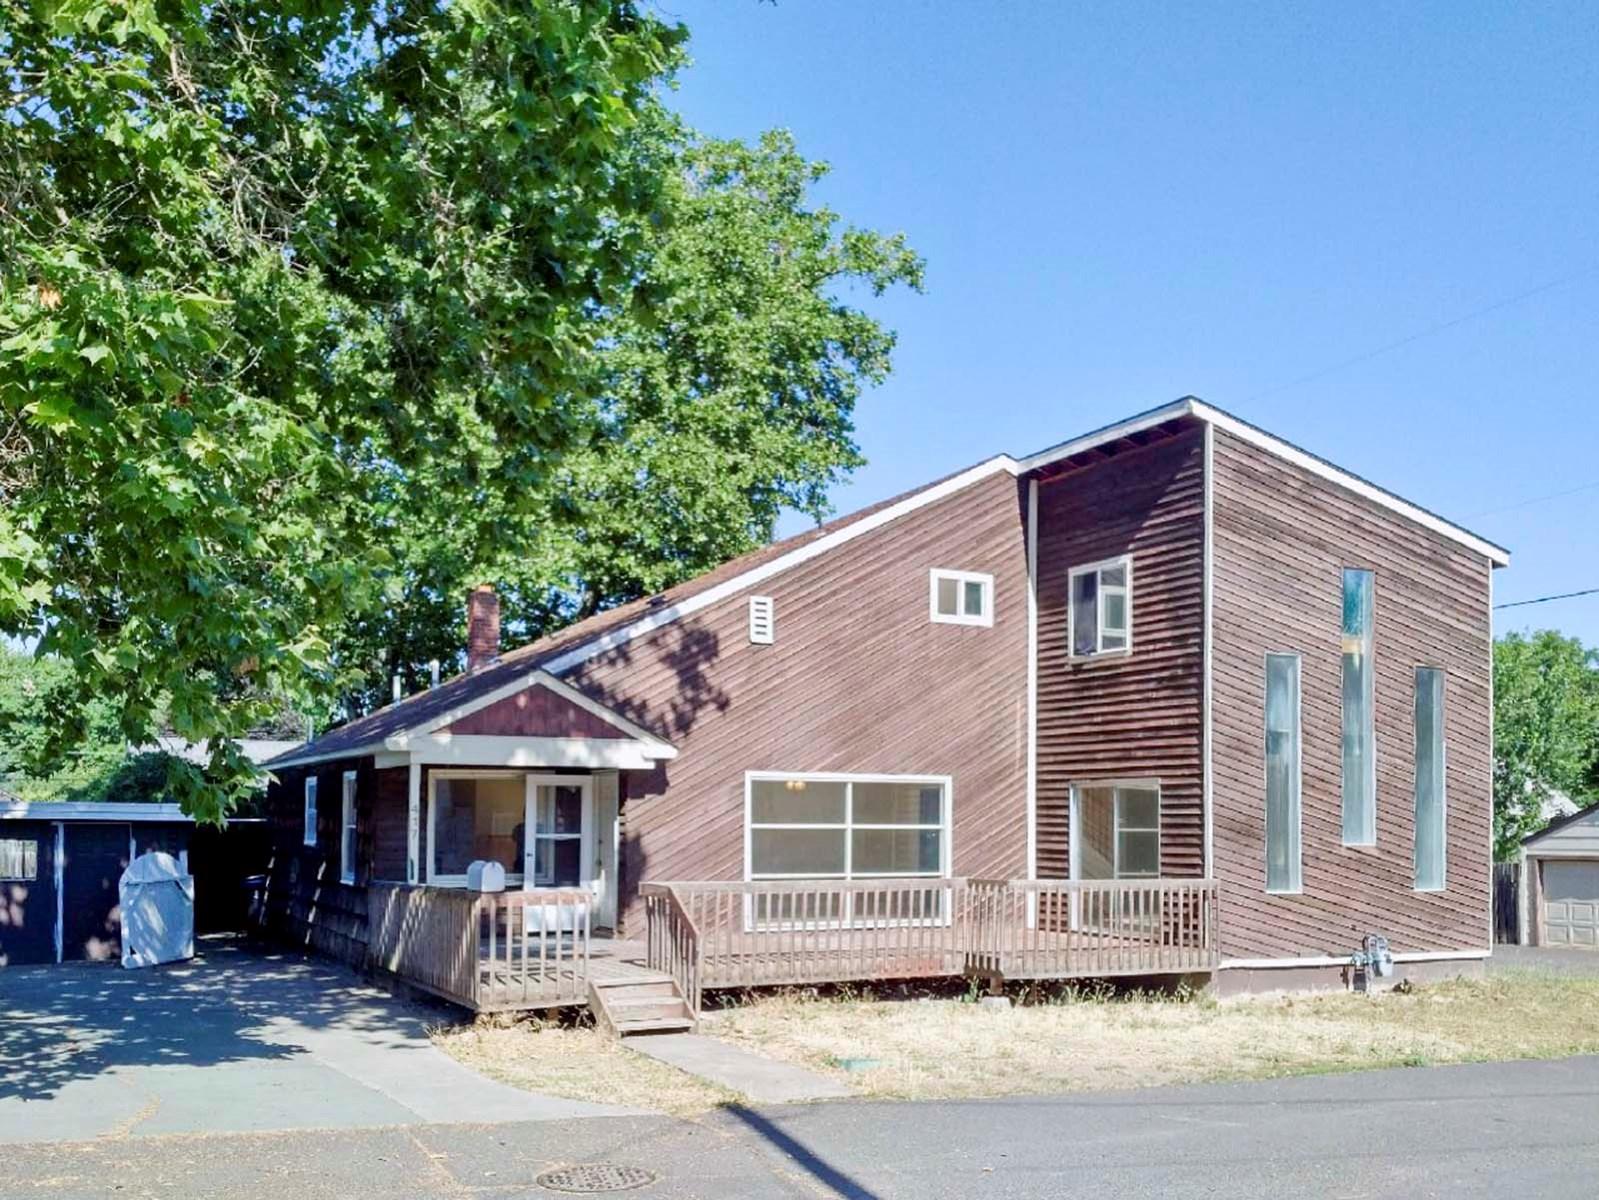 Walla Walla WA home for sale near Whitman College, rental